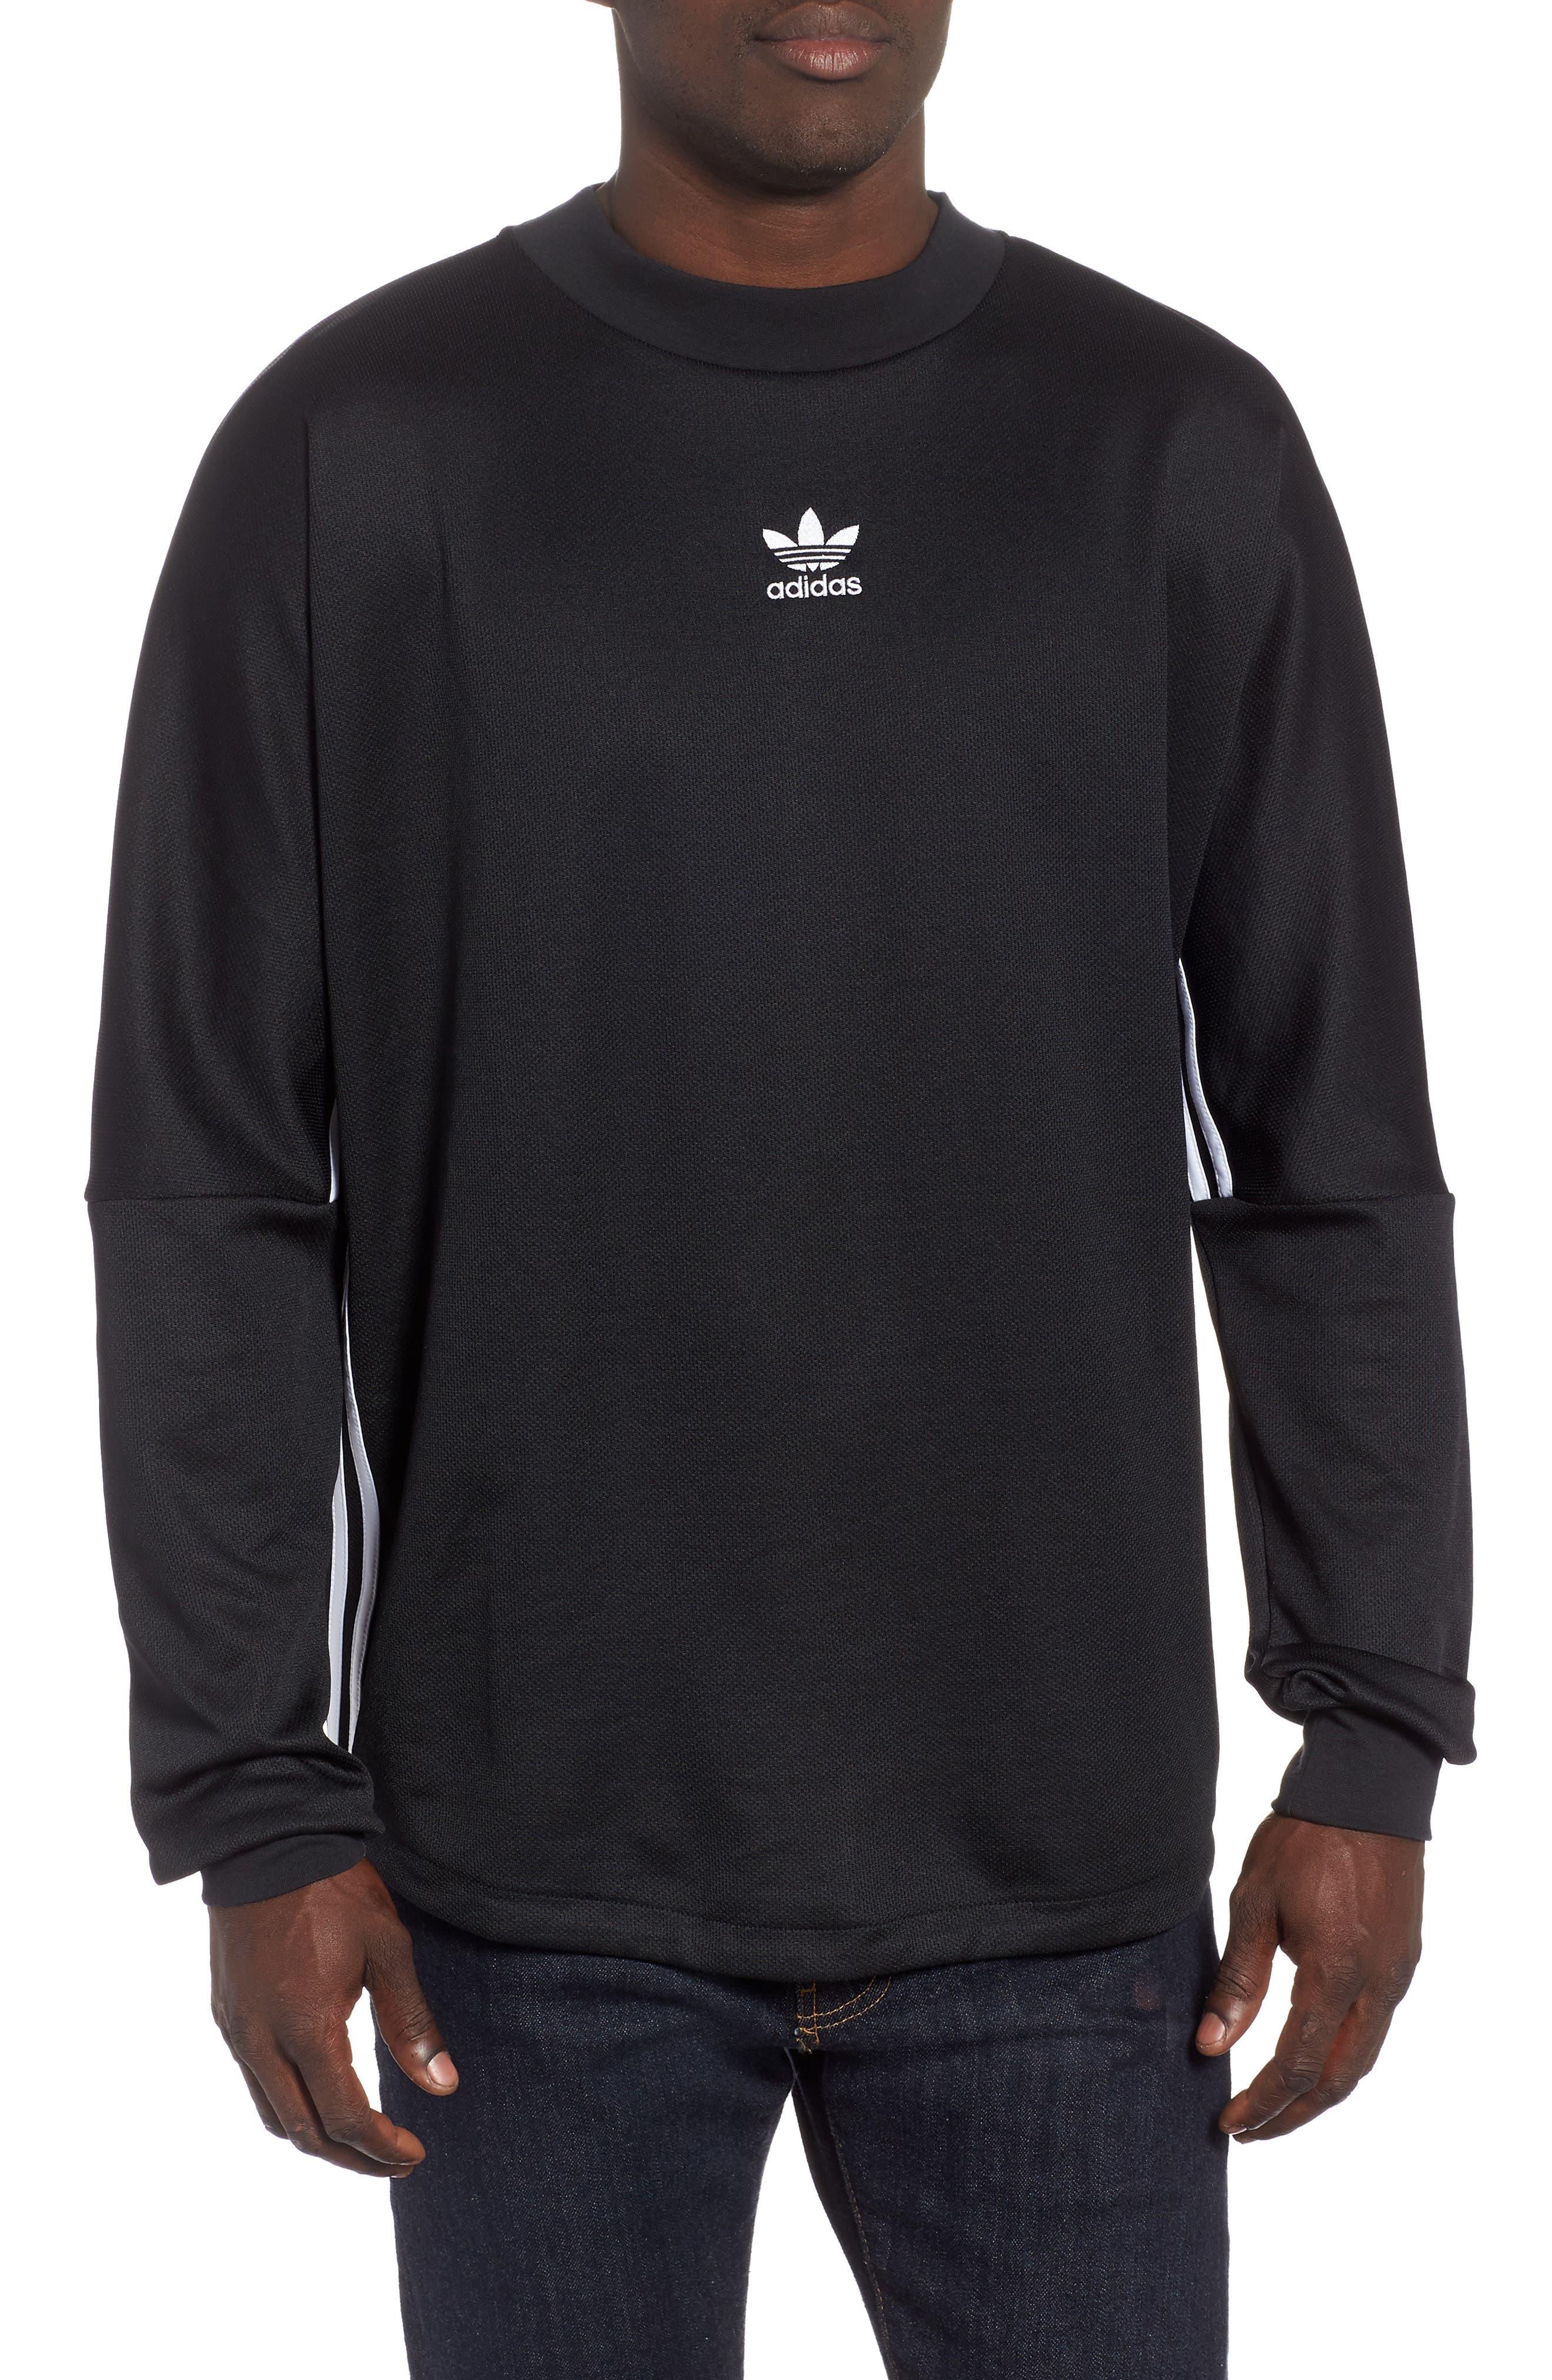 Authentics Long Sleeve Goalie Shirt,                             Main thumbnail 1, color,                             BLACK/ WHITE